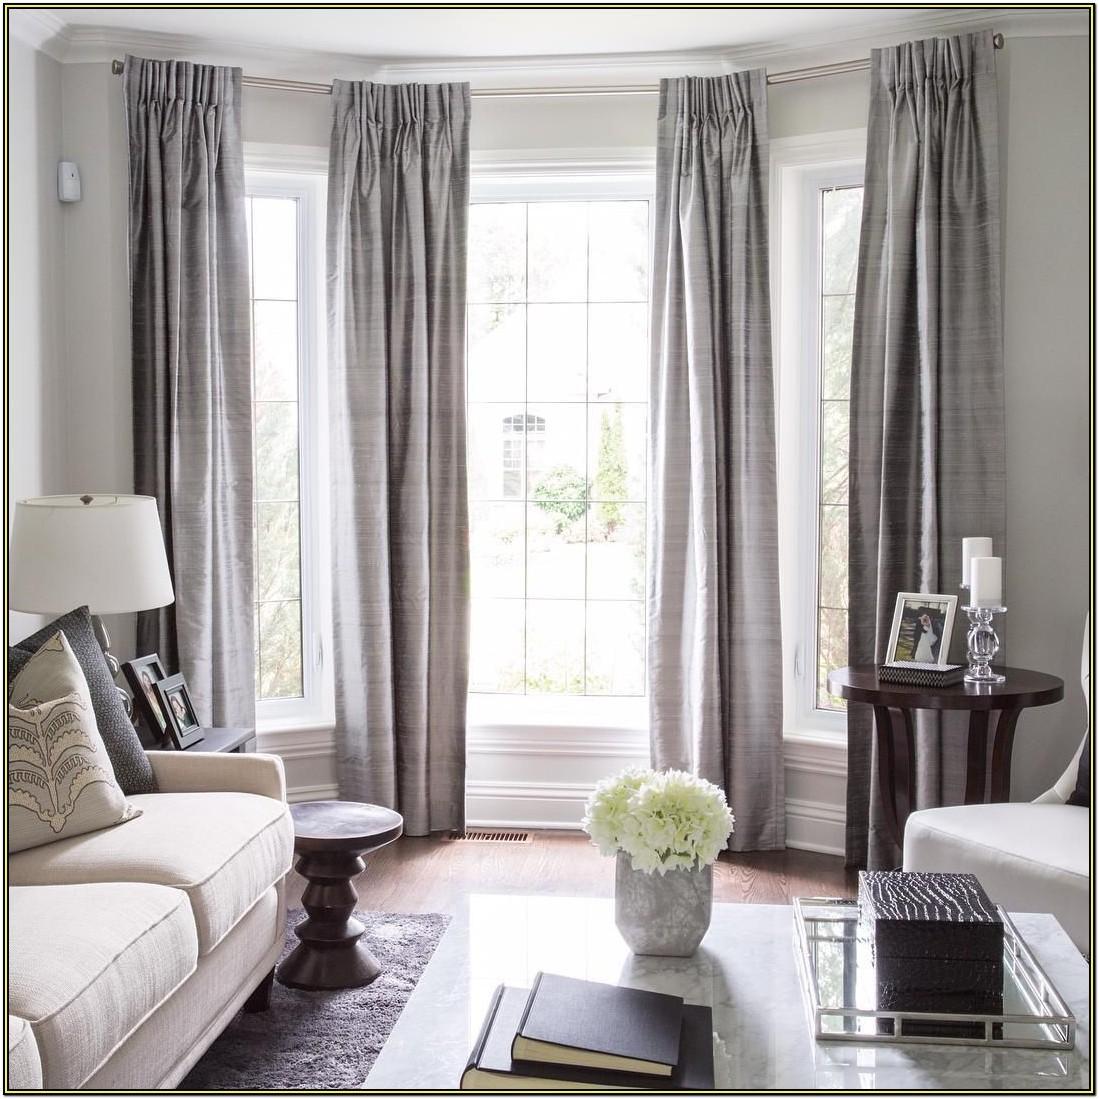 Best Type Of Blinds For Living Room